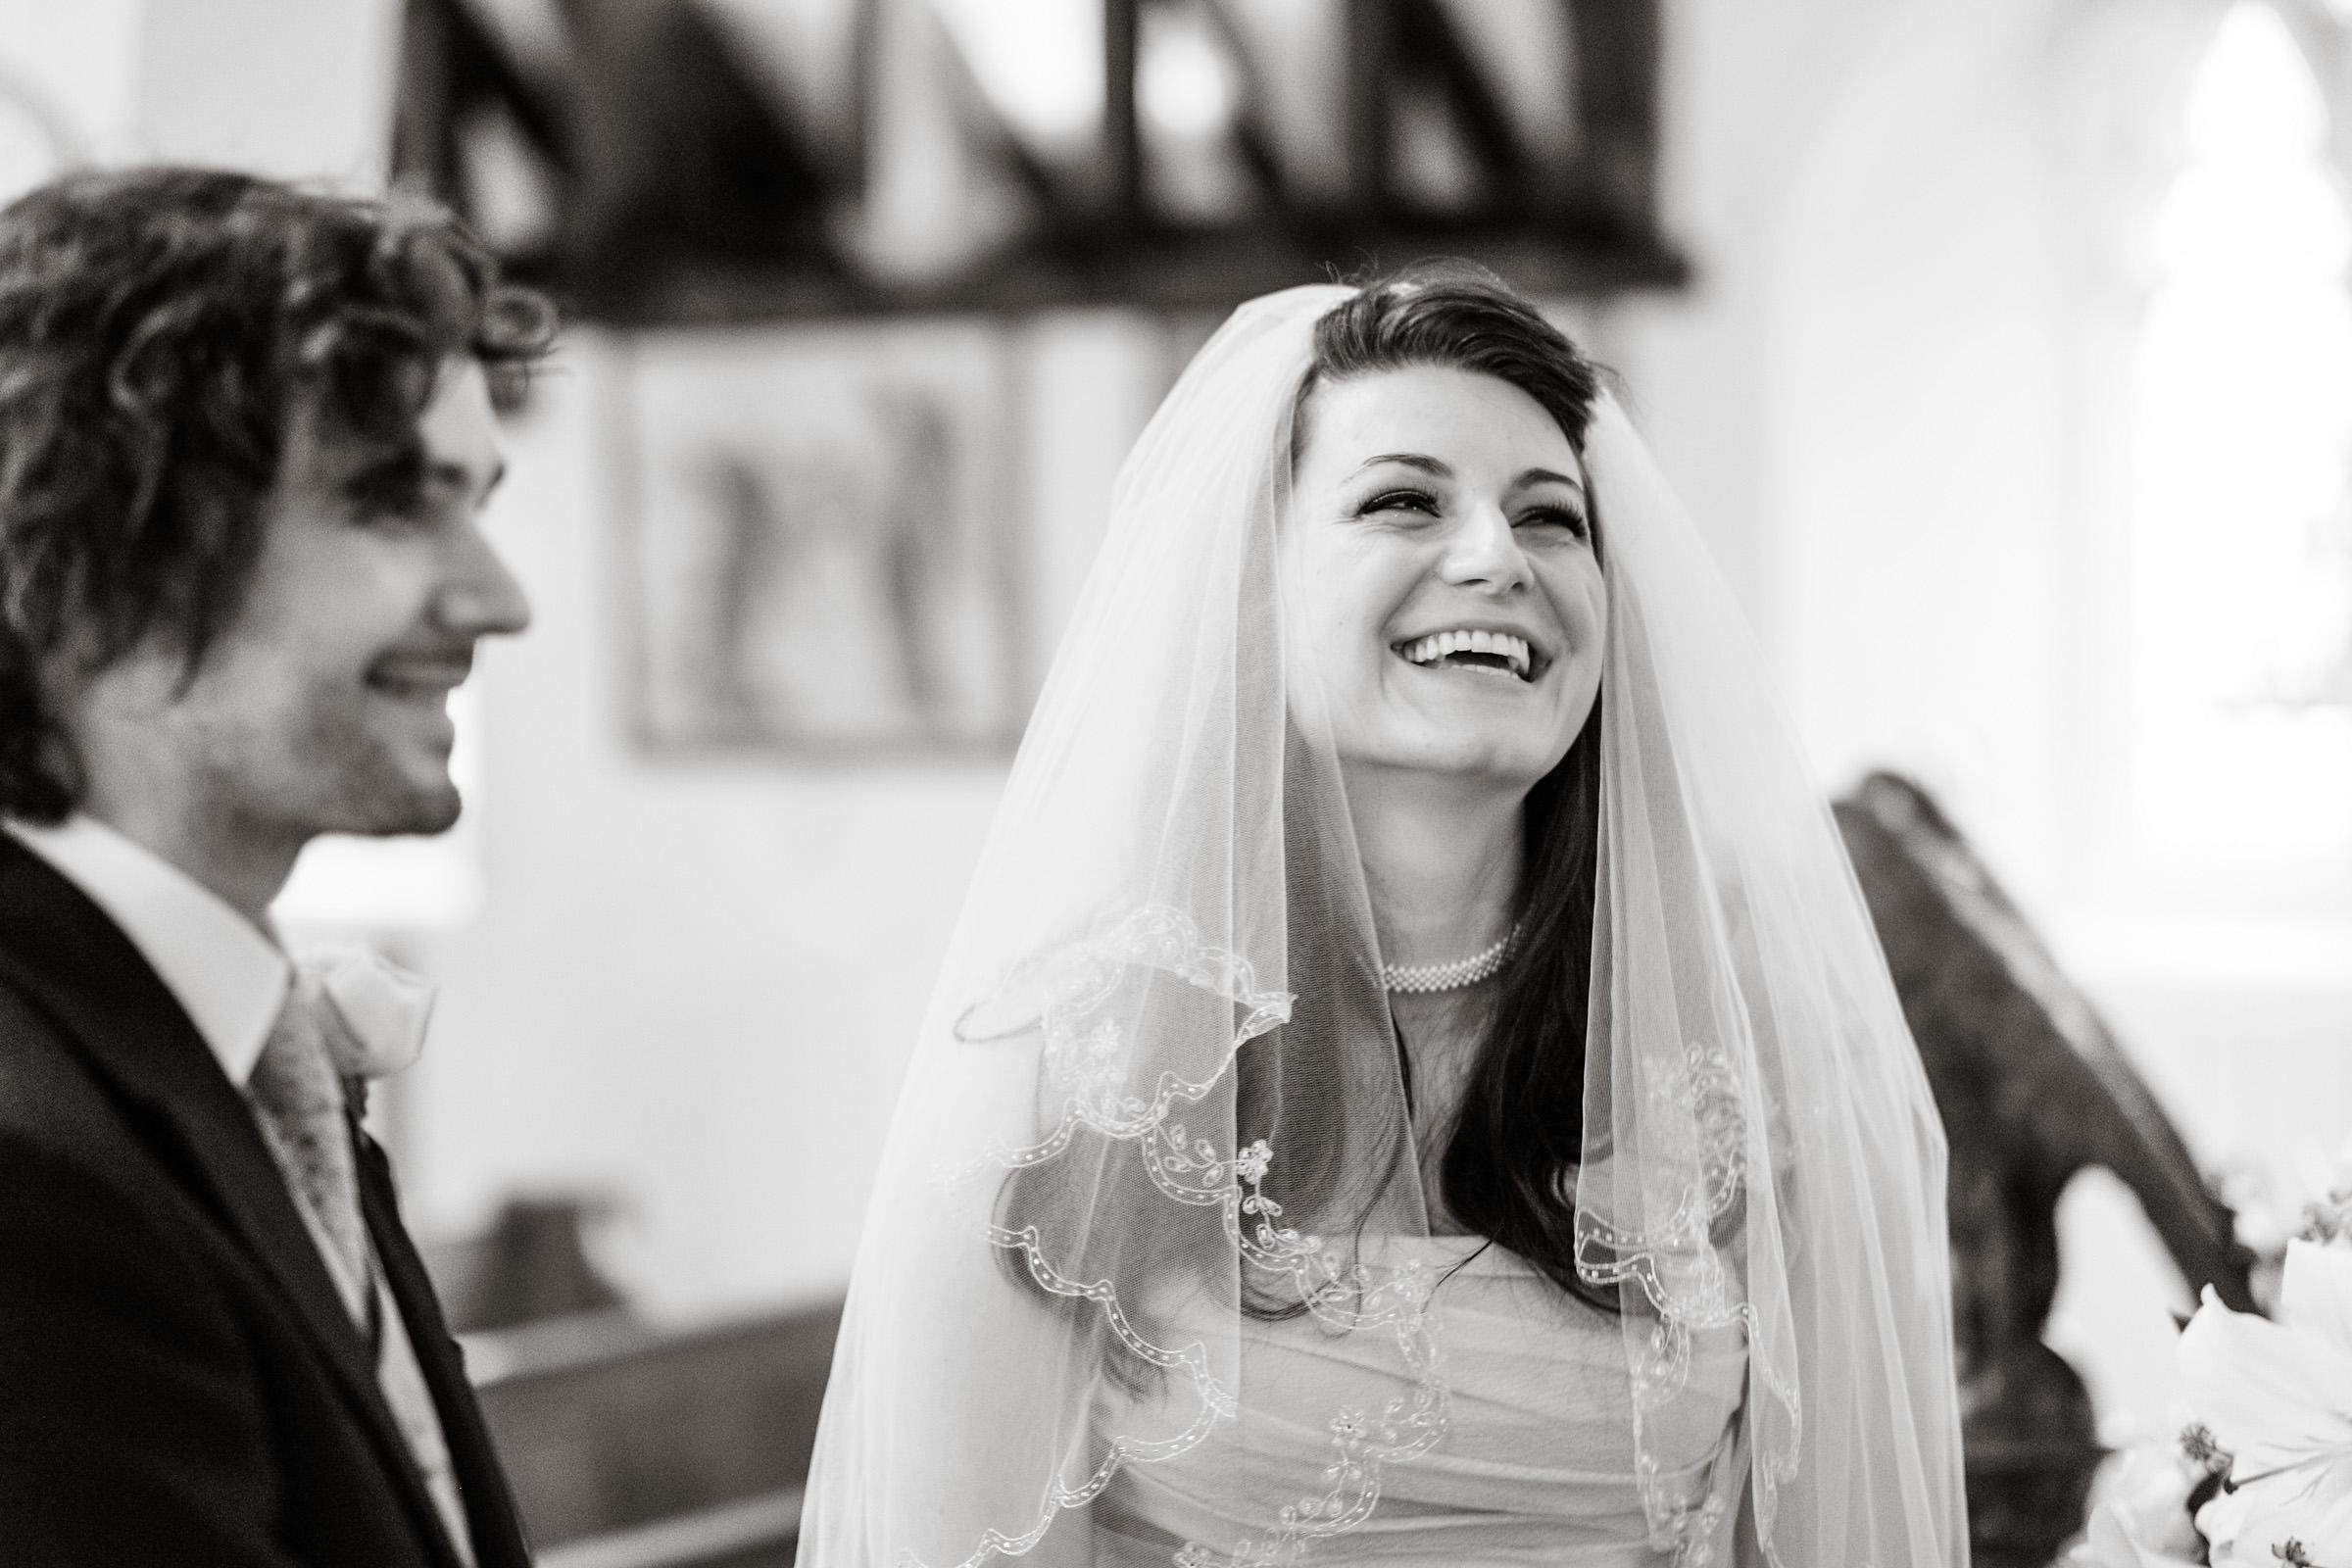 Wedding+at+De+Vere+Gorse+Hill+in+Surrey+014.jpg